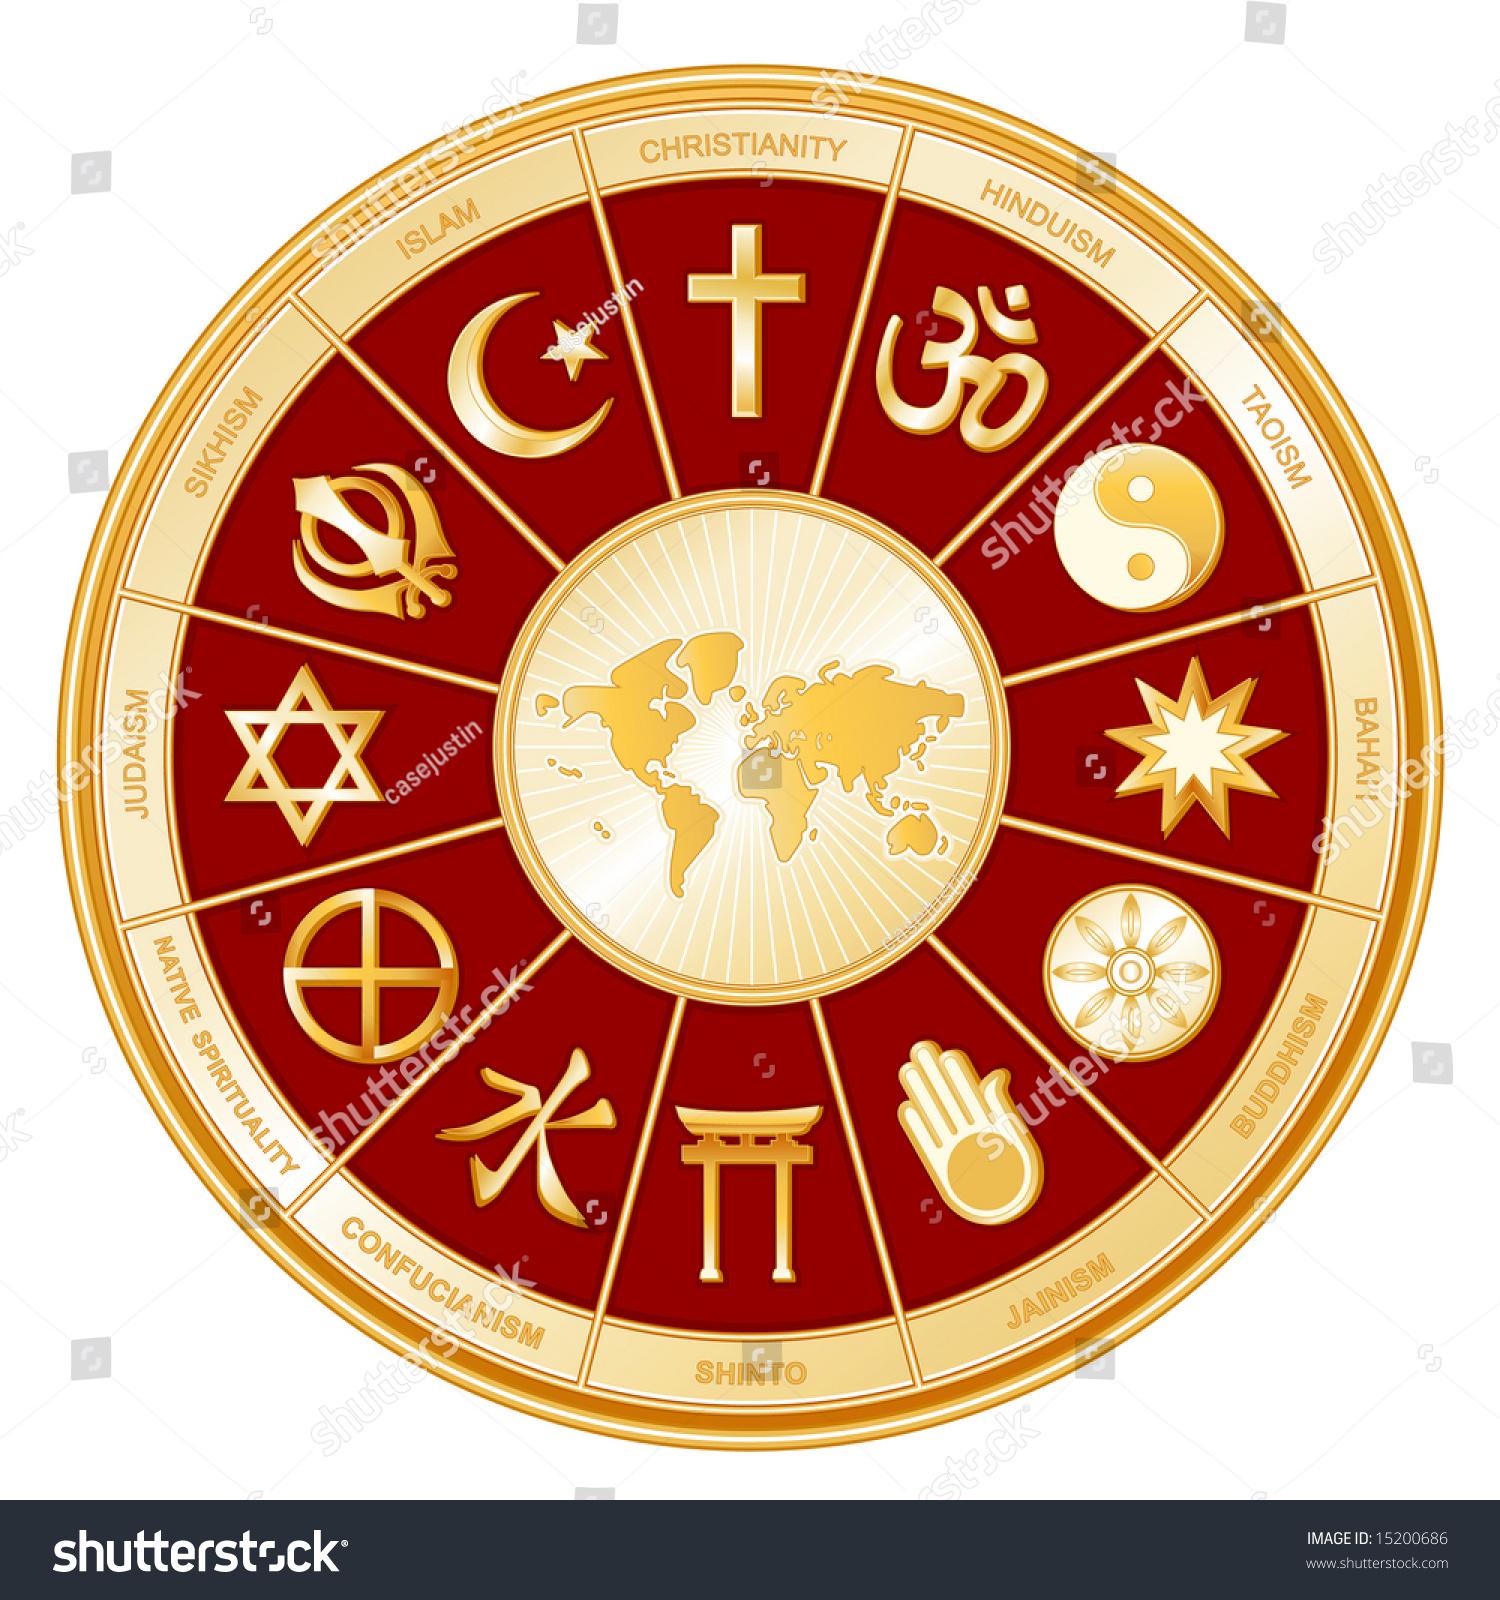 world of faiths 12 world religions in golden circle